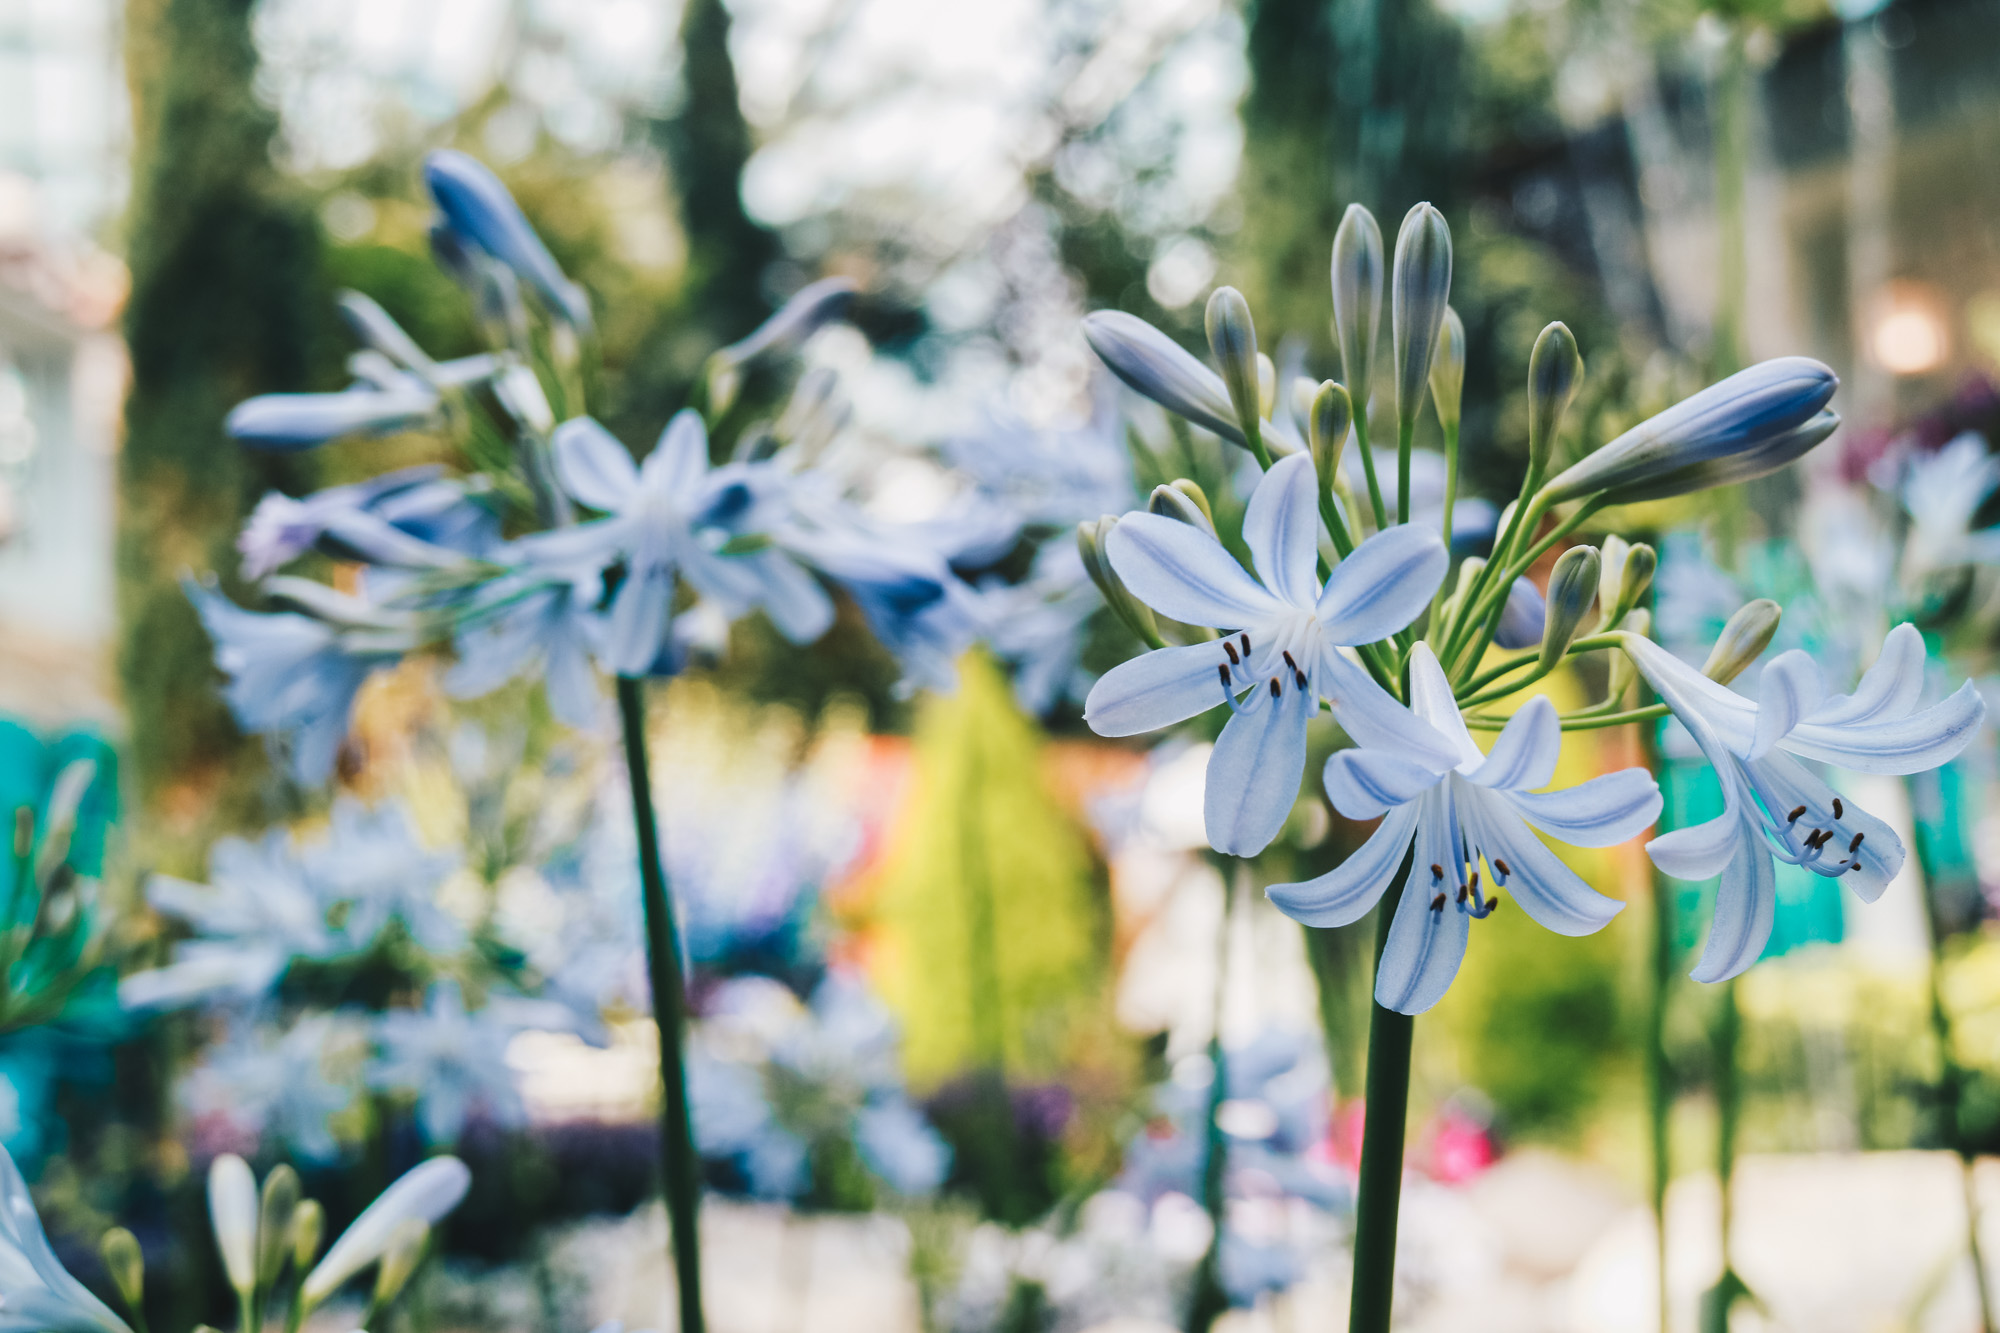 Blue-beauties-floral-display-gardensbythebay-darrenbloggie4